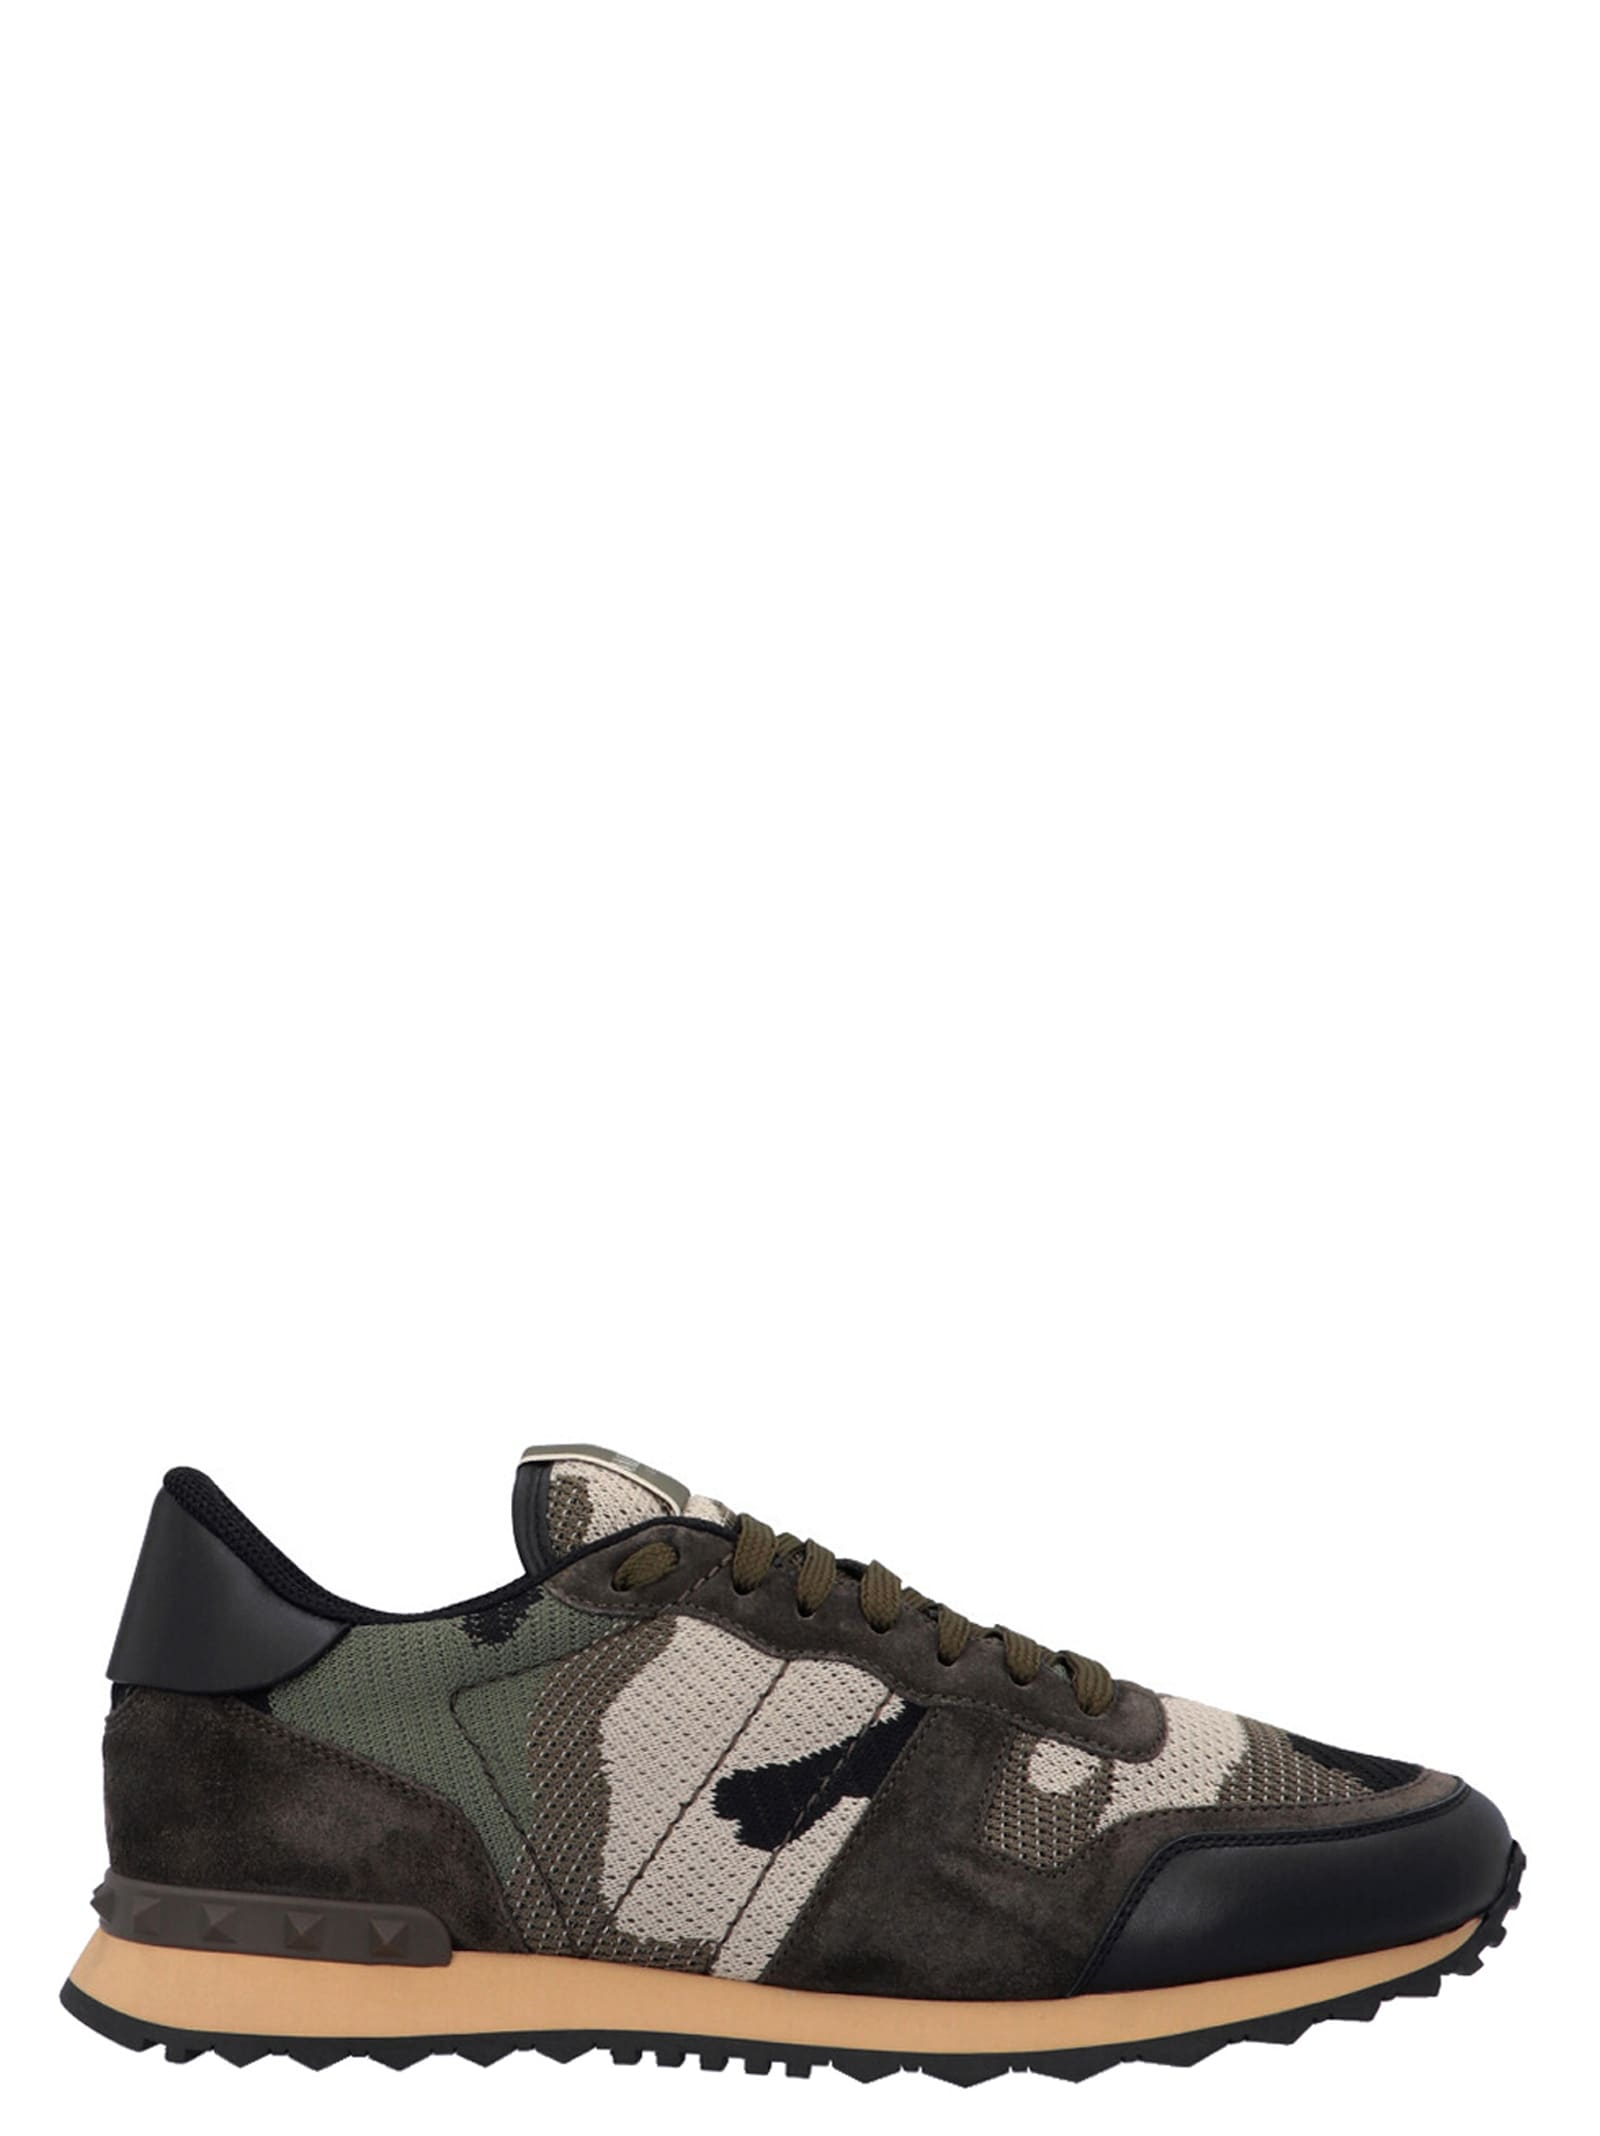 Valentino Garavani rockrunner Shoes